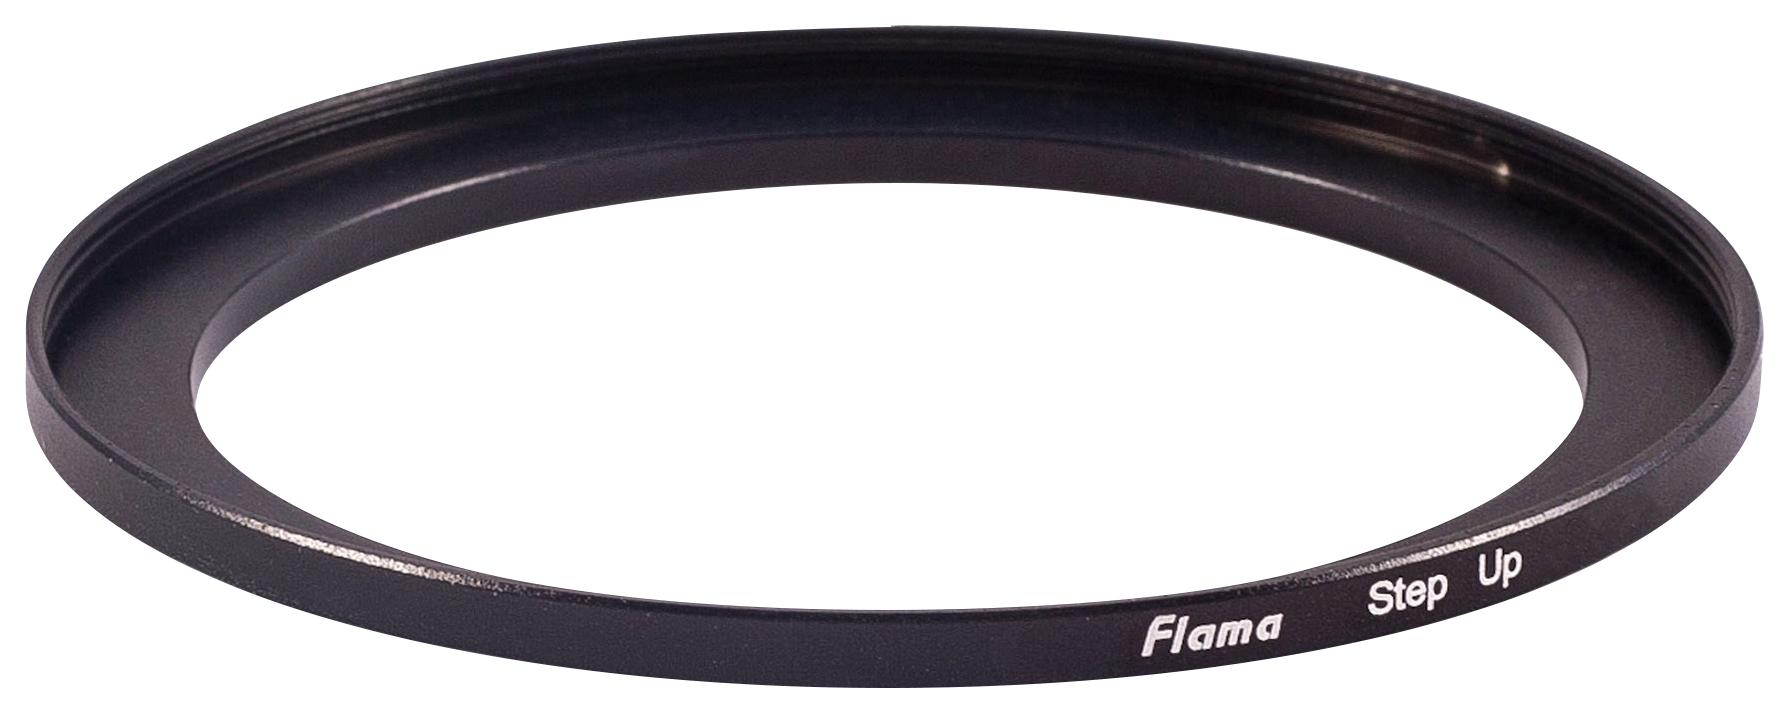 Flama ���������� ������ ��� ������� 49-52 mm